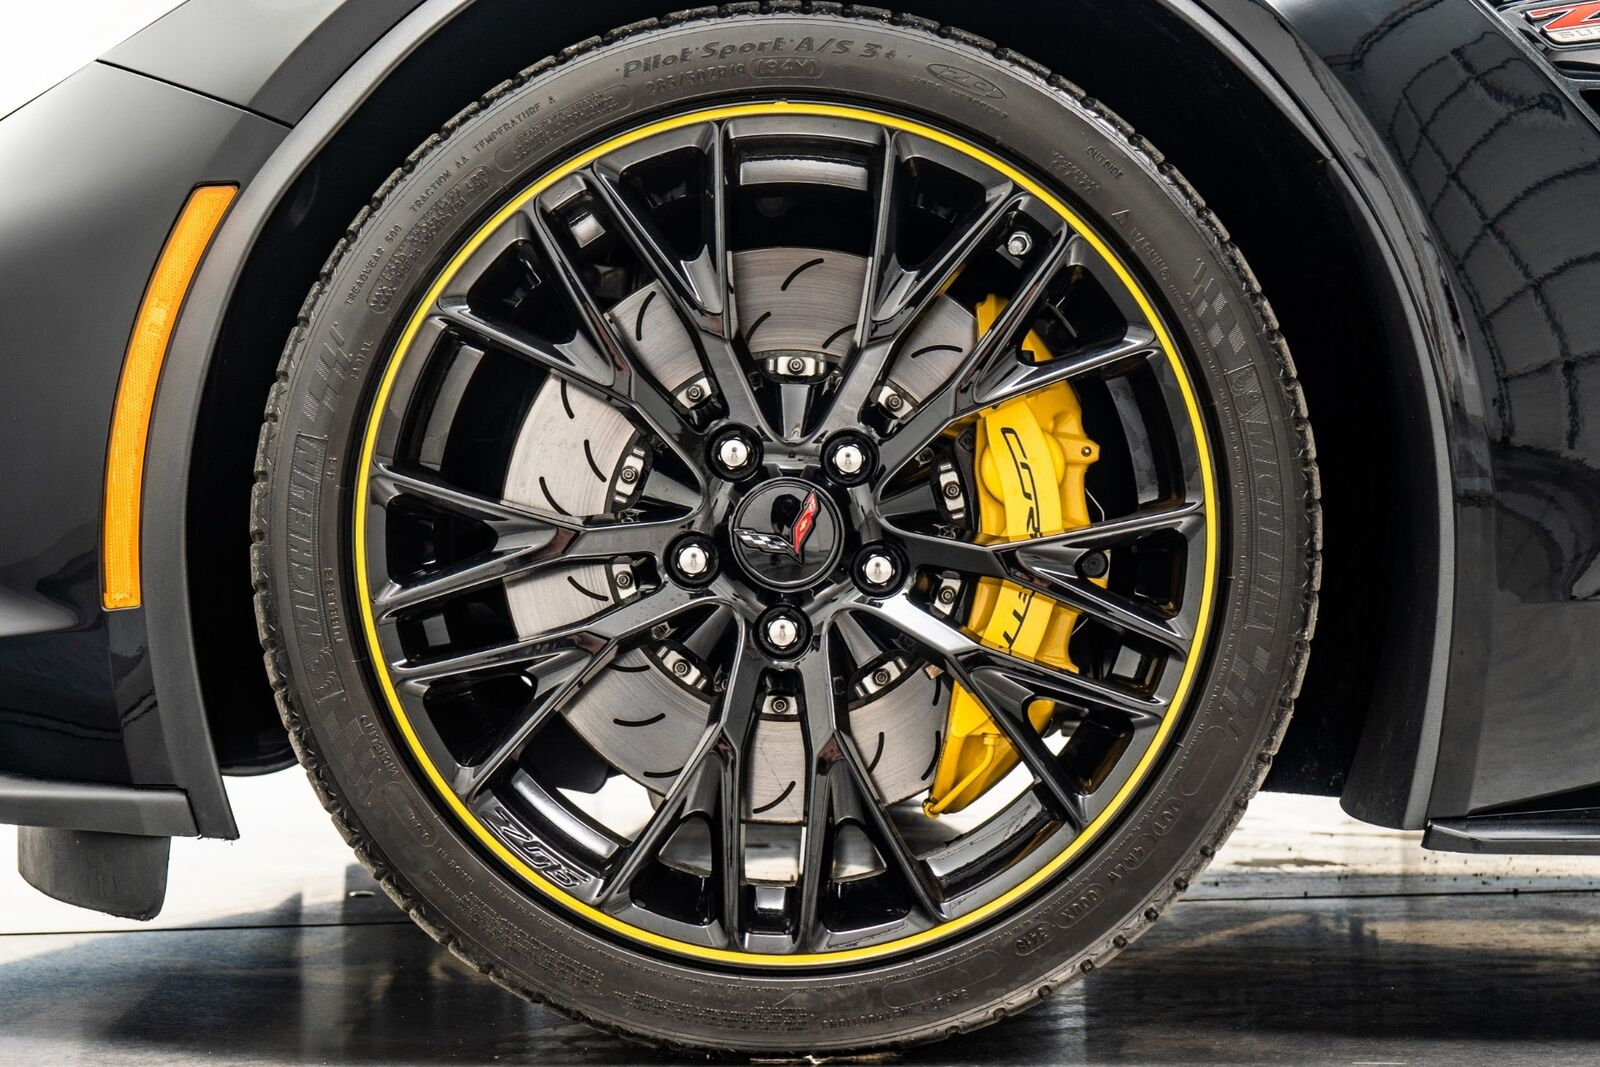 2018 Black Chevrolet Corvette Z06 3LZ   C7 Corvette Photo 9